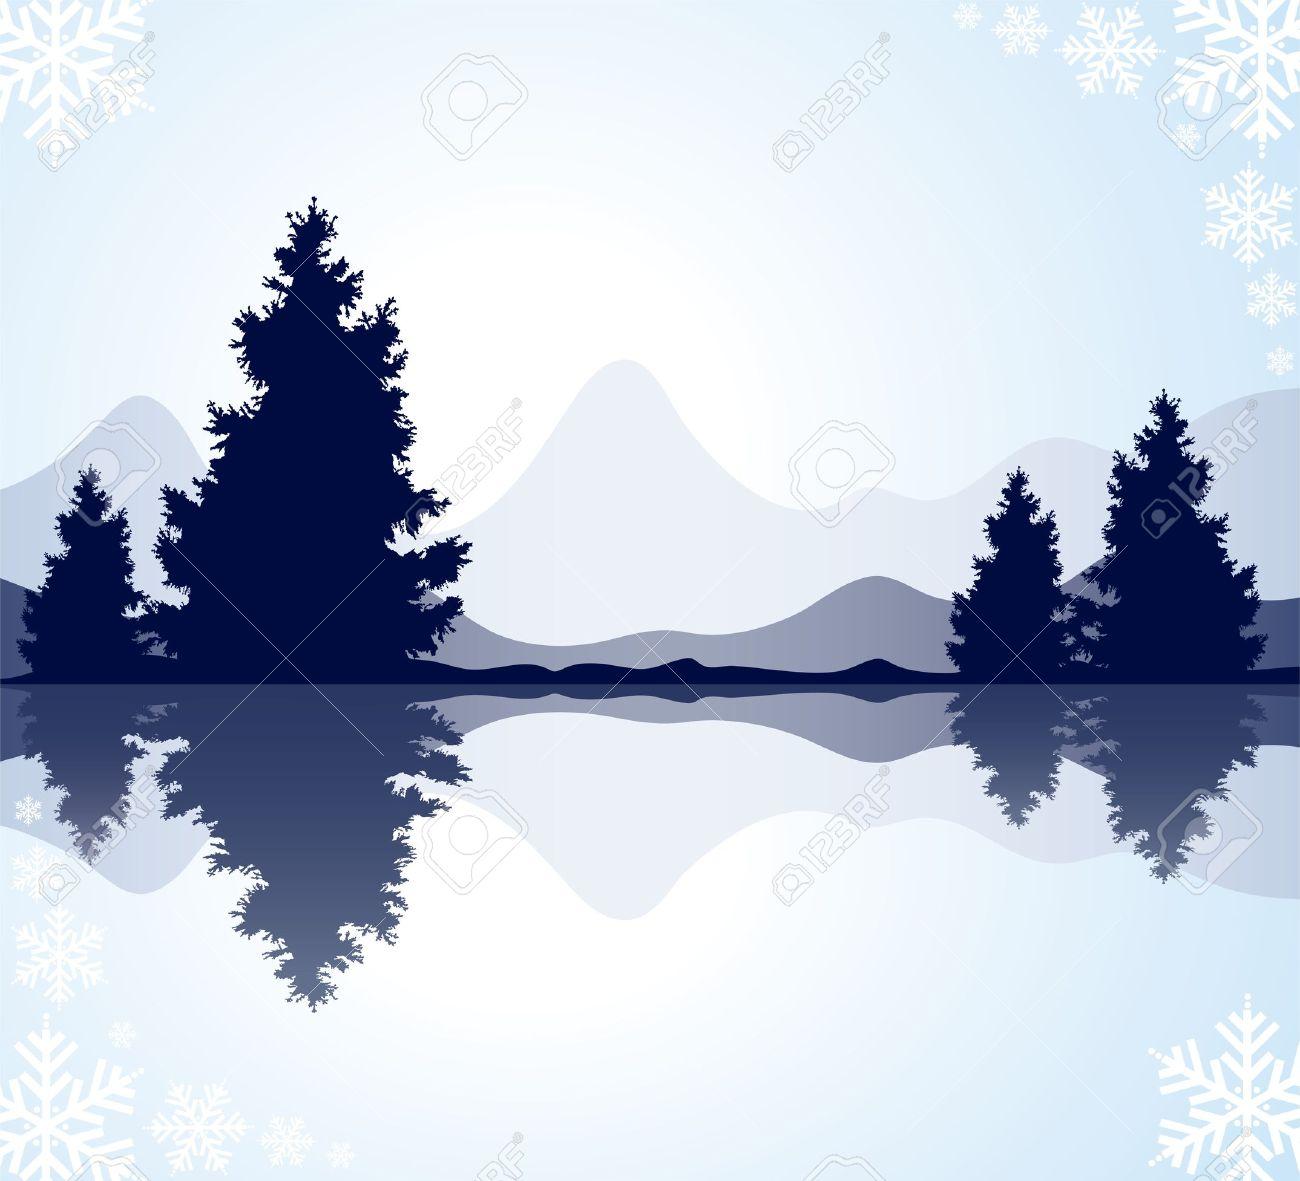 Reflection in Lake Clip Art.